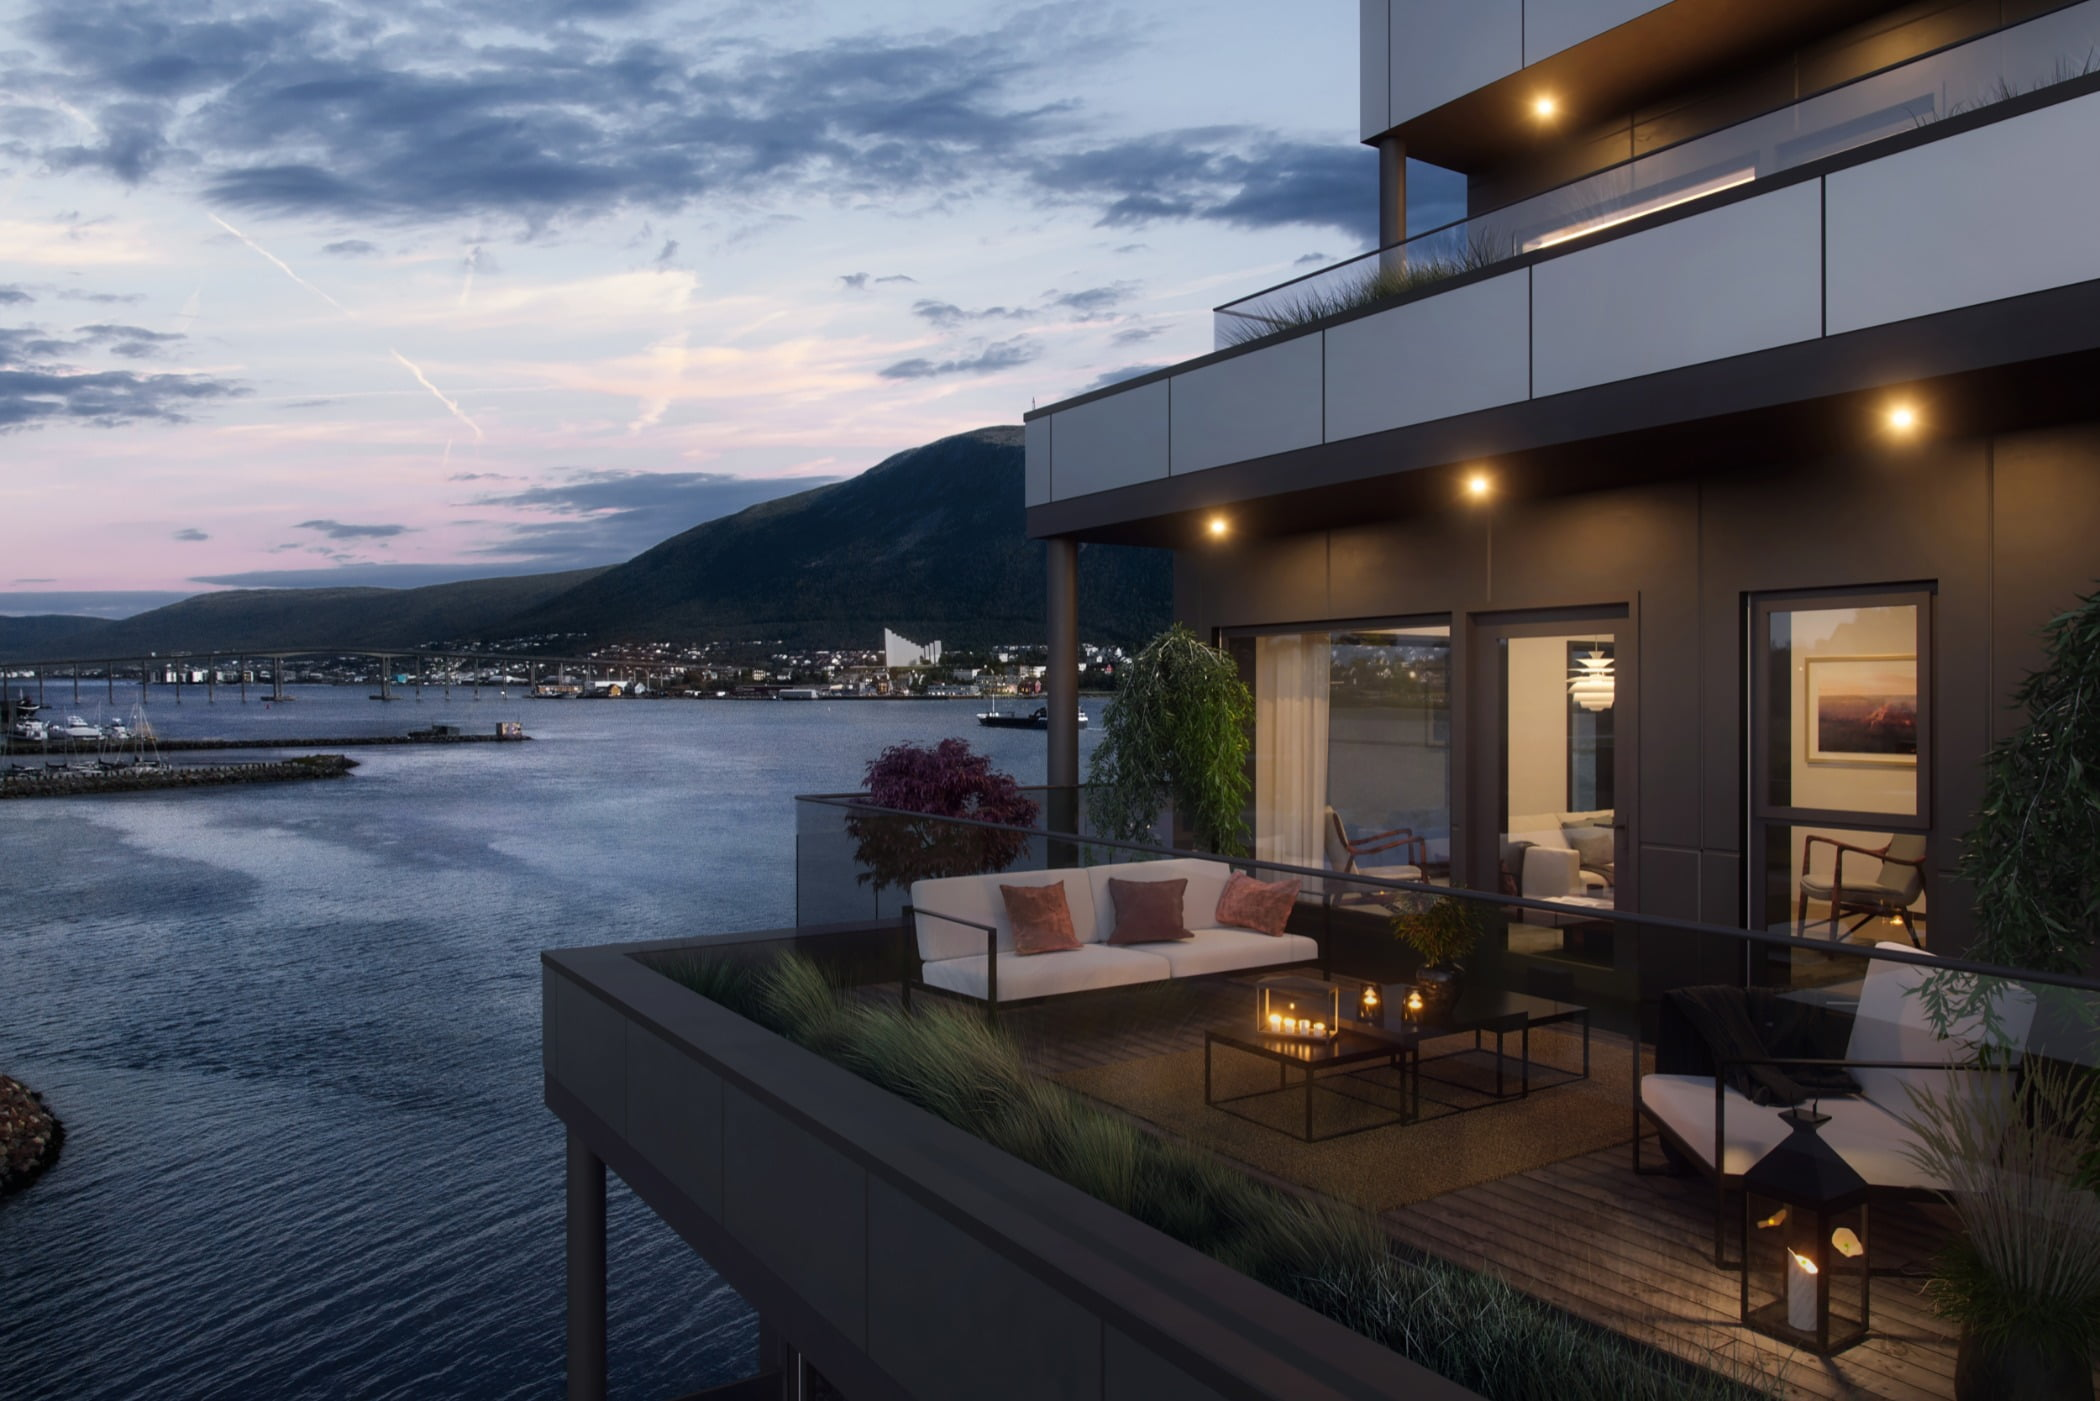 Interior design, Cloud, Sky, Building, Property, Plant, Window, Houseplant, Flowerpot, Water